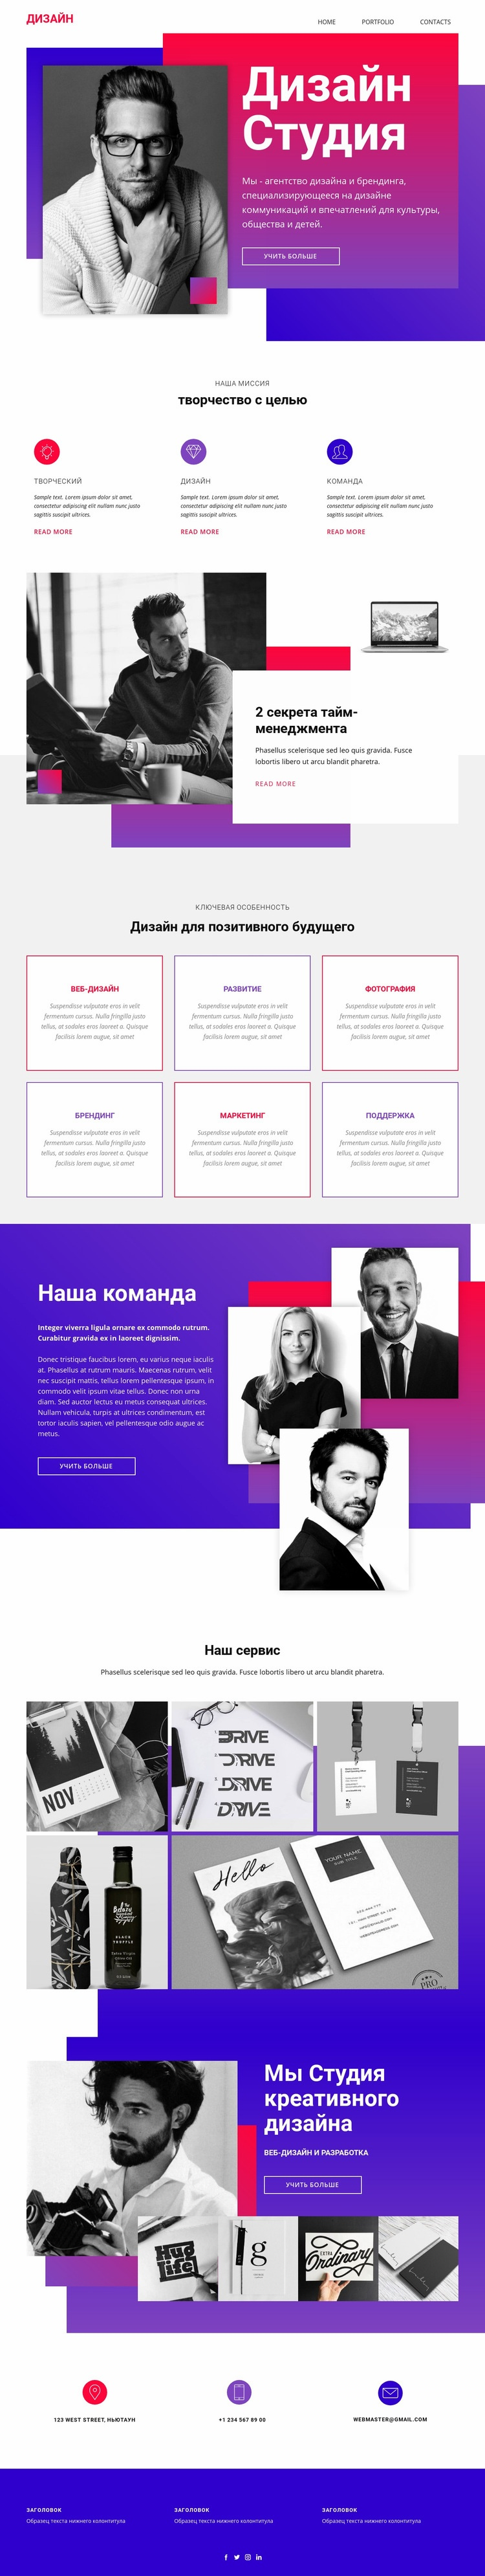 Время веб-дизайна Шаблон веб-сайта